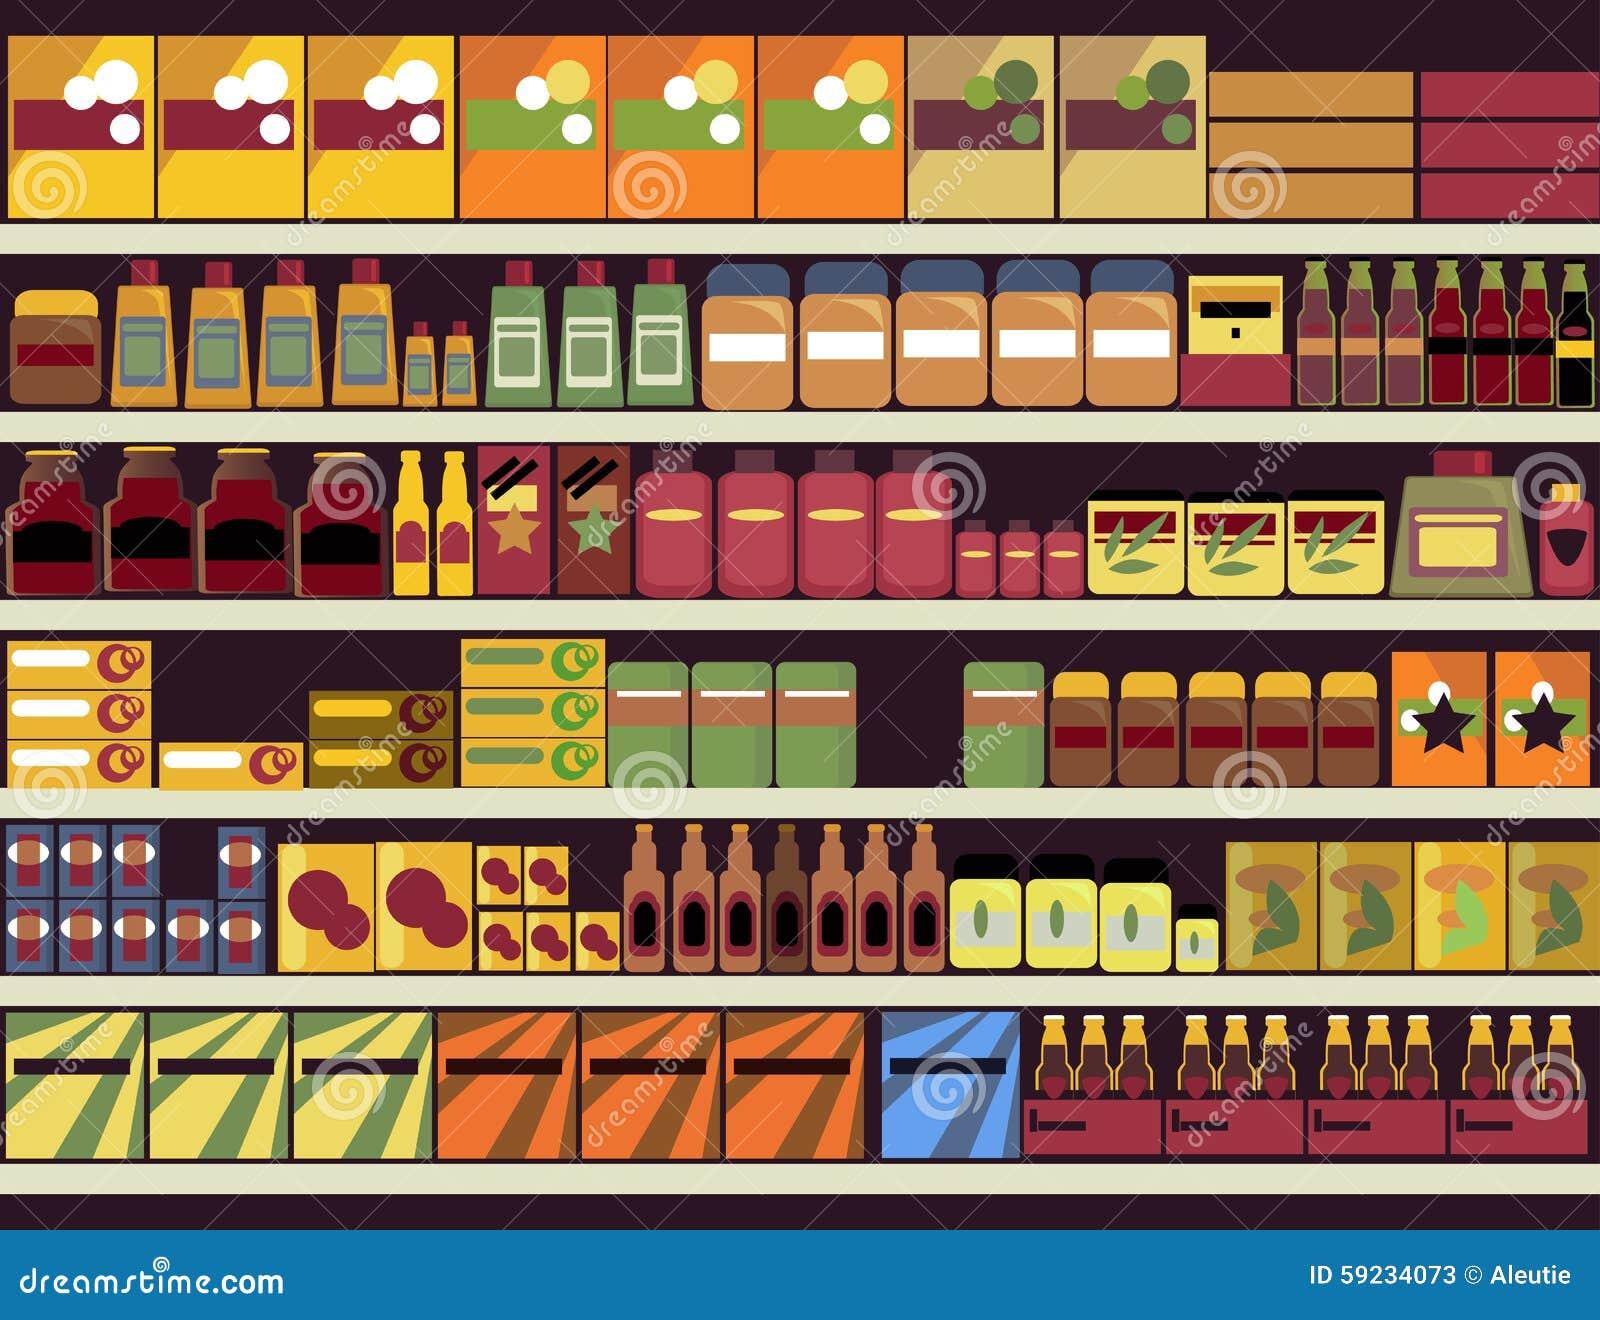 Vending Services Sample Business Plan